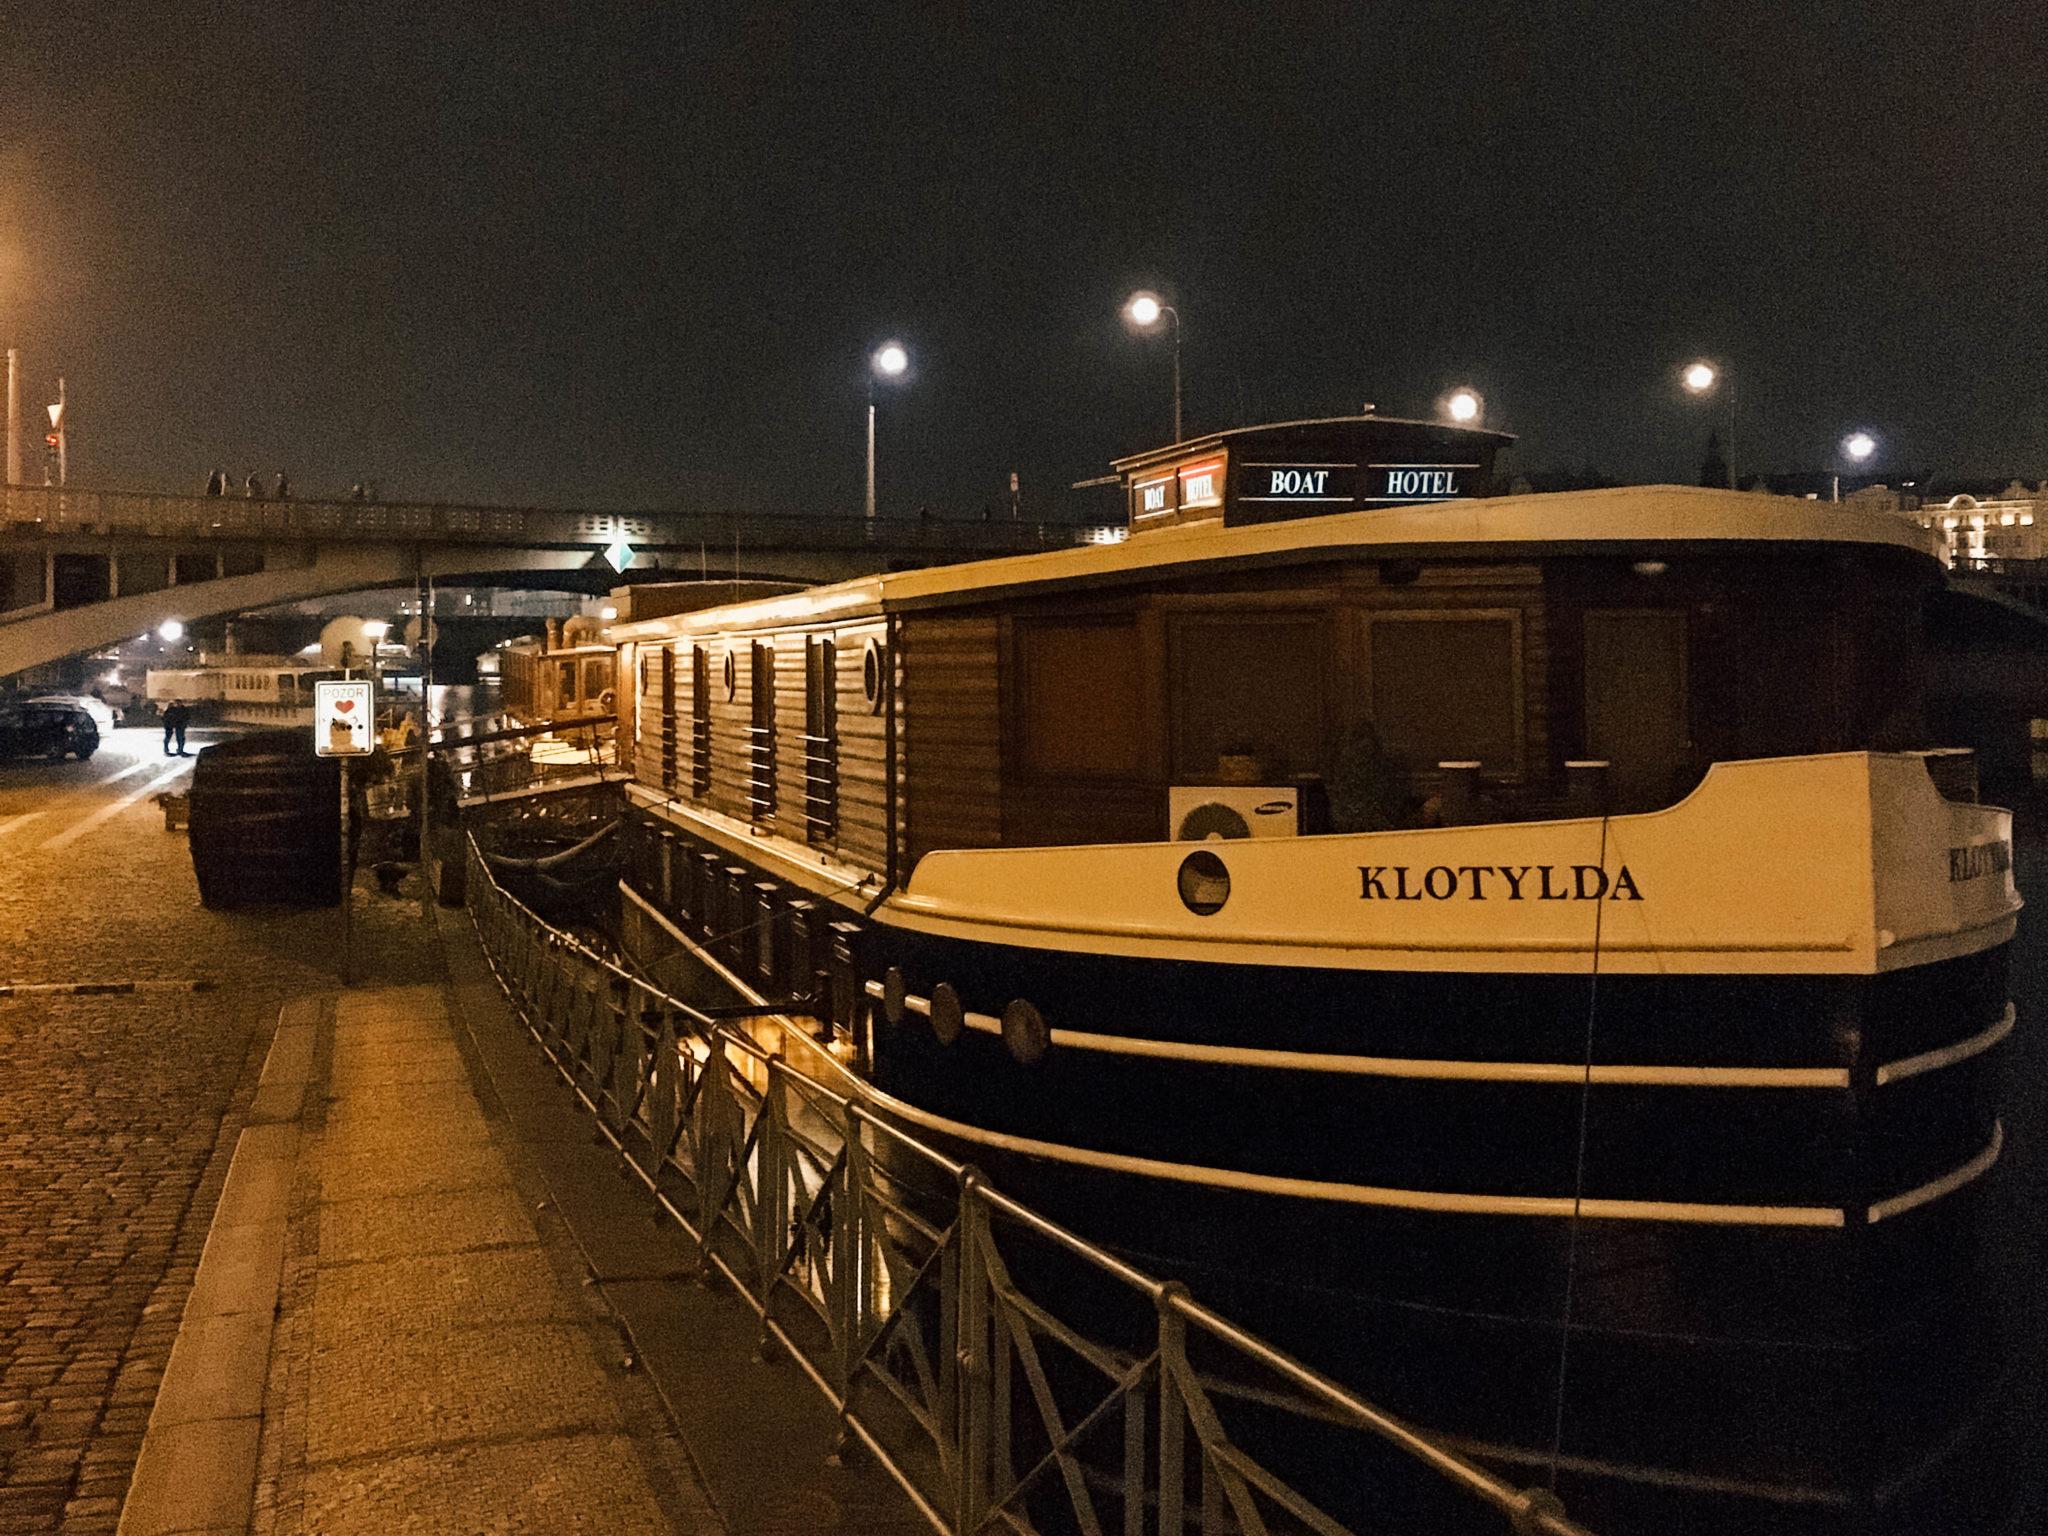 Le Boat Hotel Matylda accosté au bord de l'eau